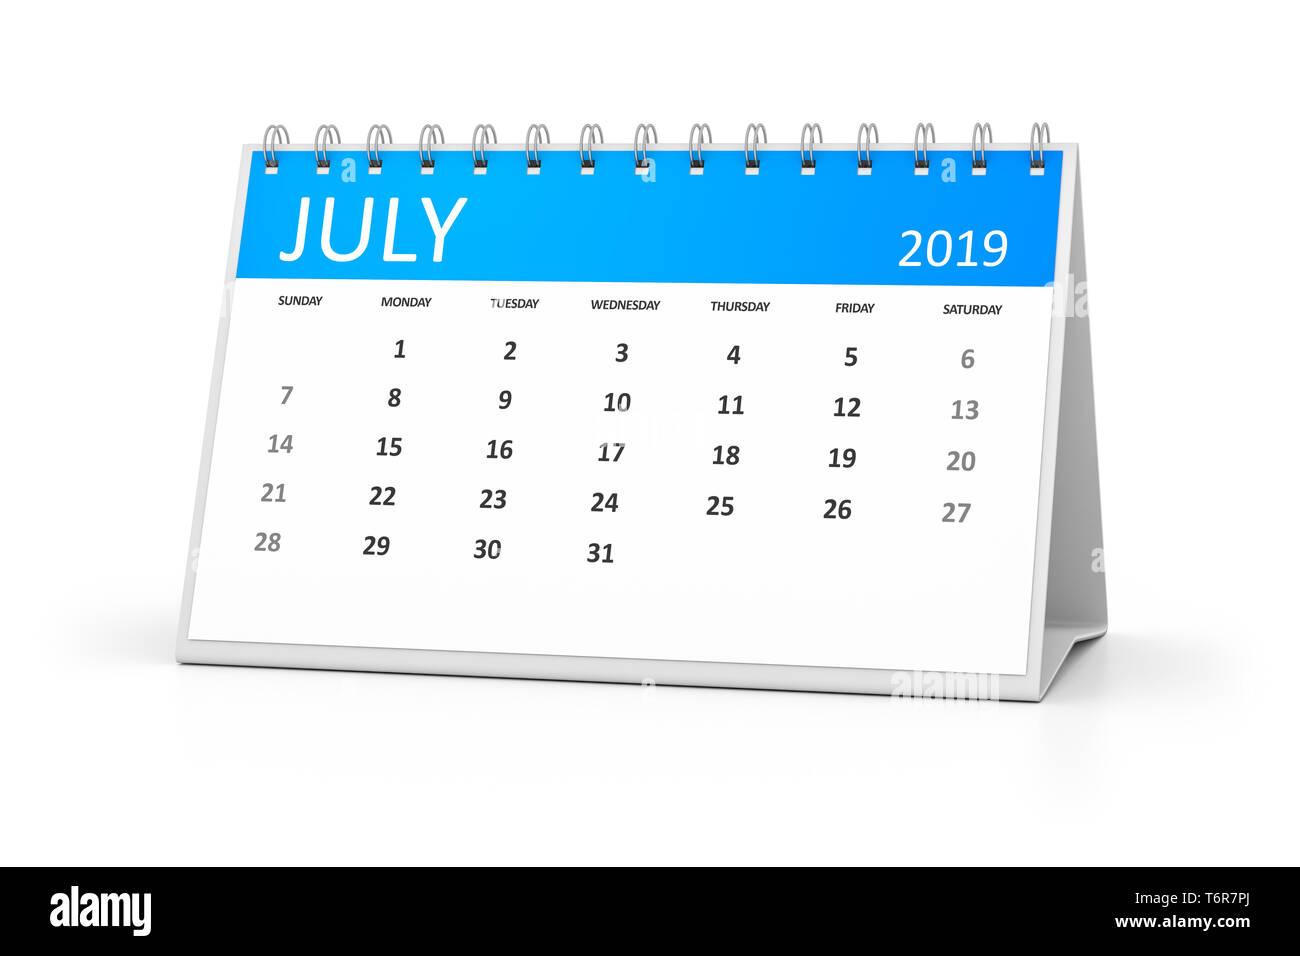 Calendario Numero Settimana 2019.2019 Desk Calendar Immagini 2019 Desk Calendar Fotos Stock